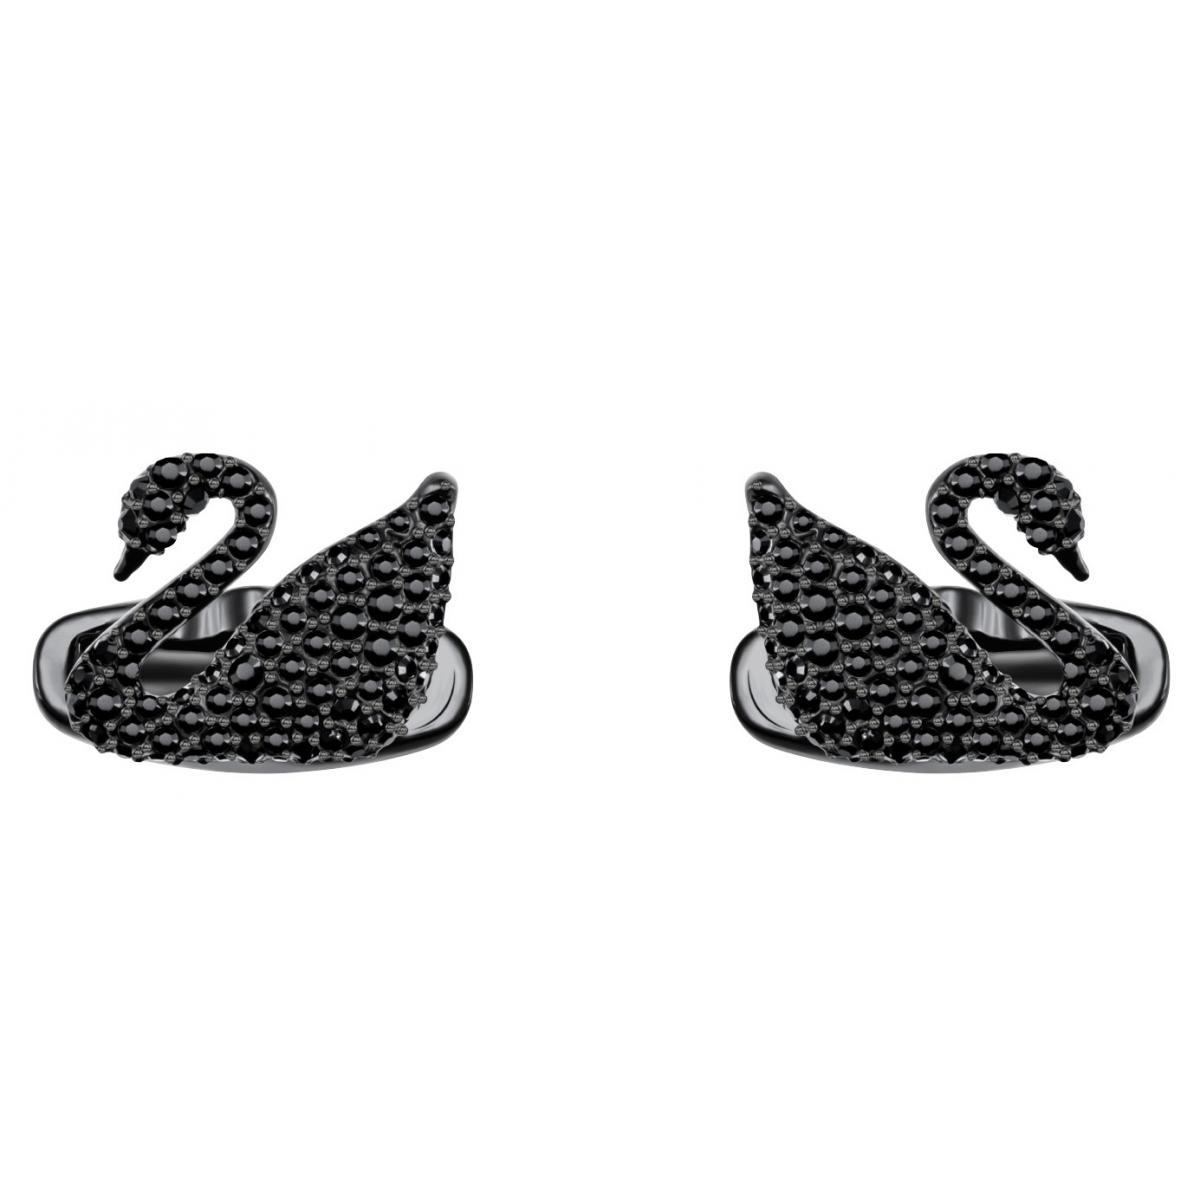 Promo : Boutons de Manchettes Swarovski Bijoux 5427129 - Acier Noir Cristaux Swarovski Femme